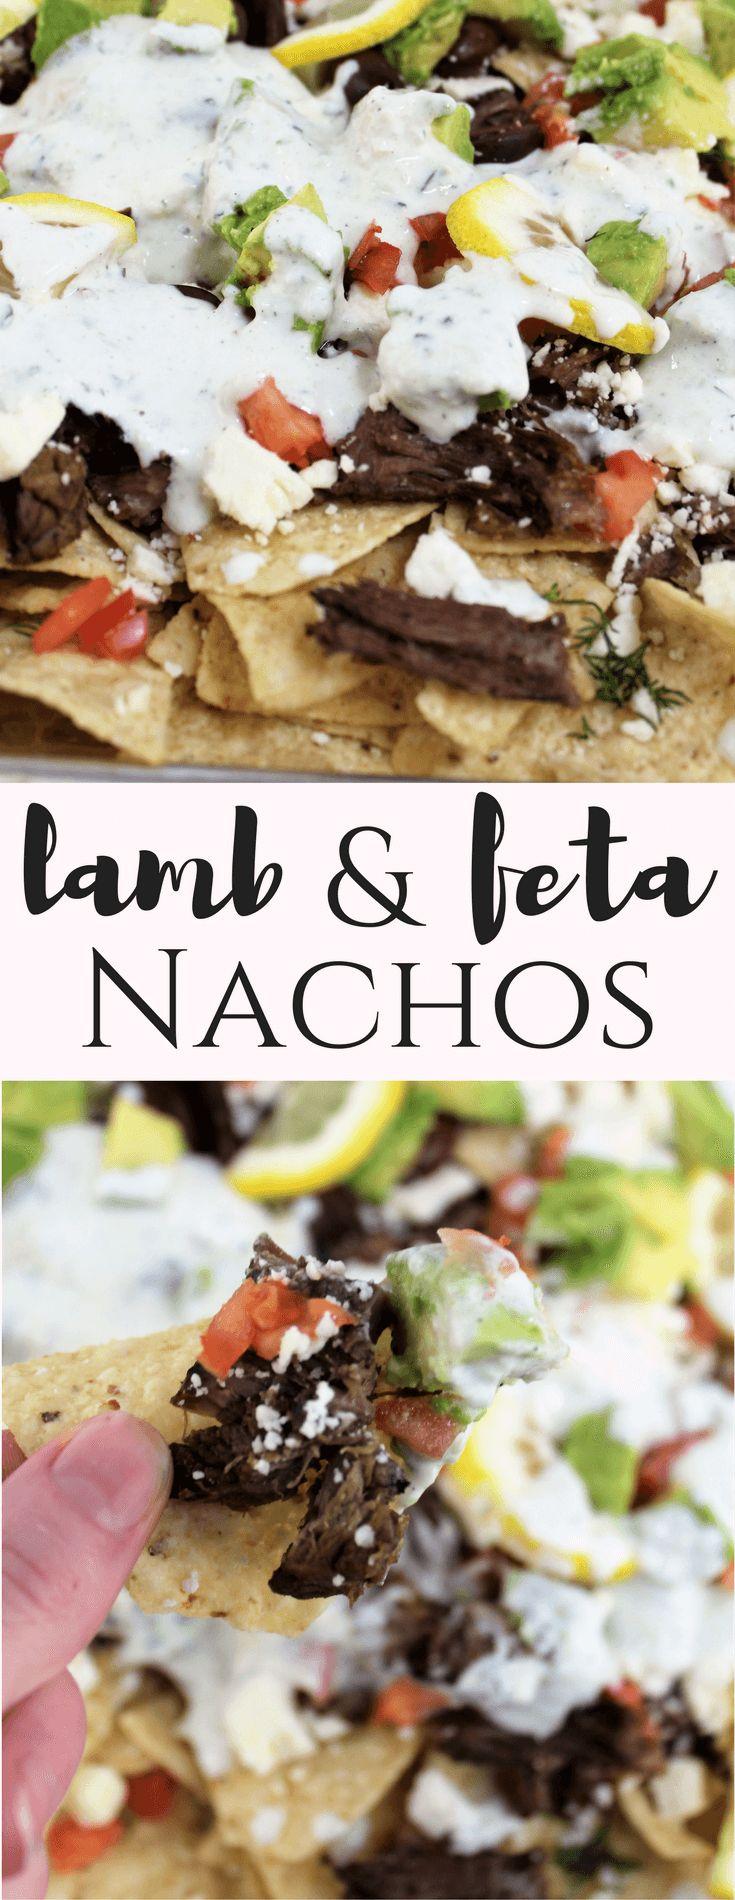 Lamb and Feta Nachos